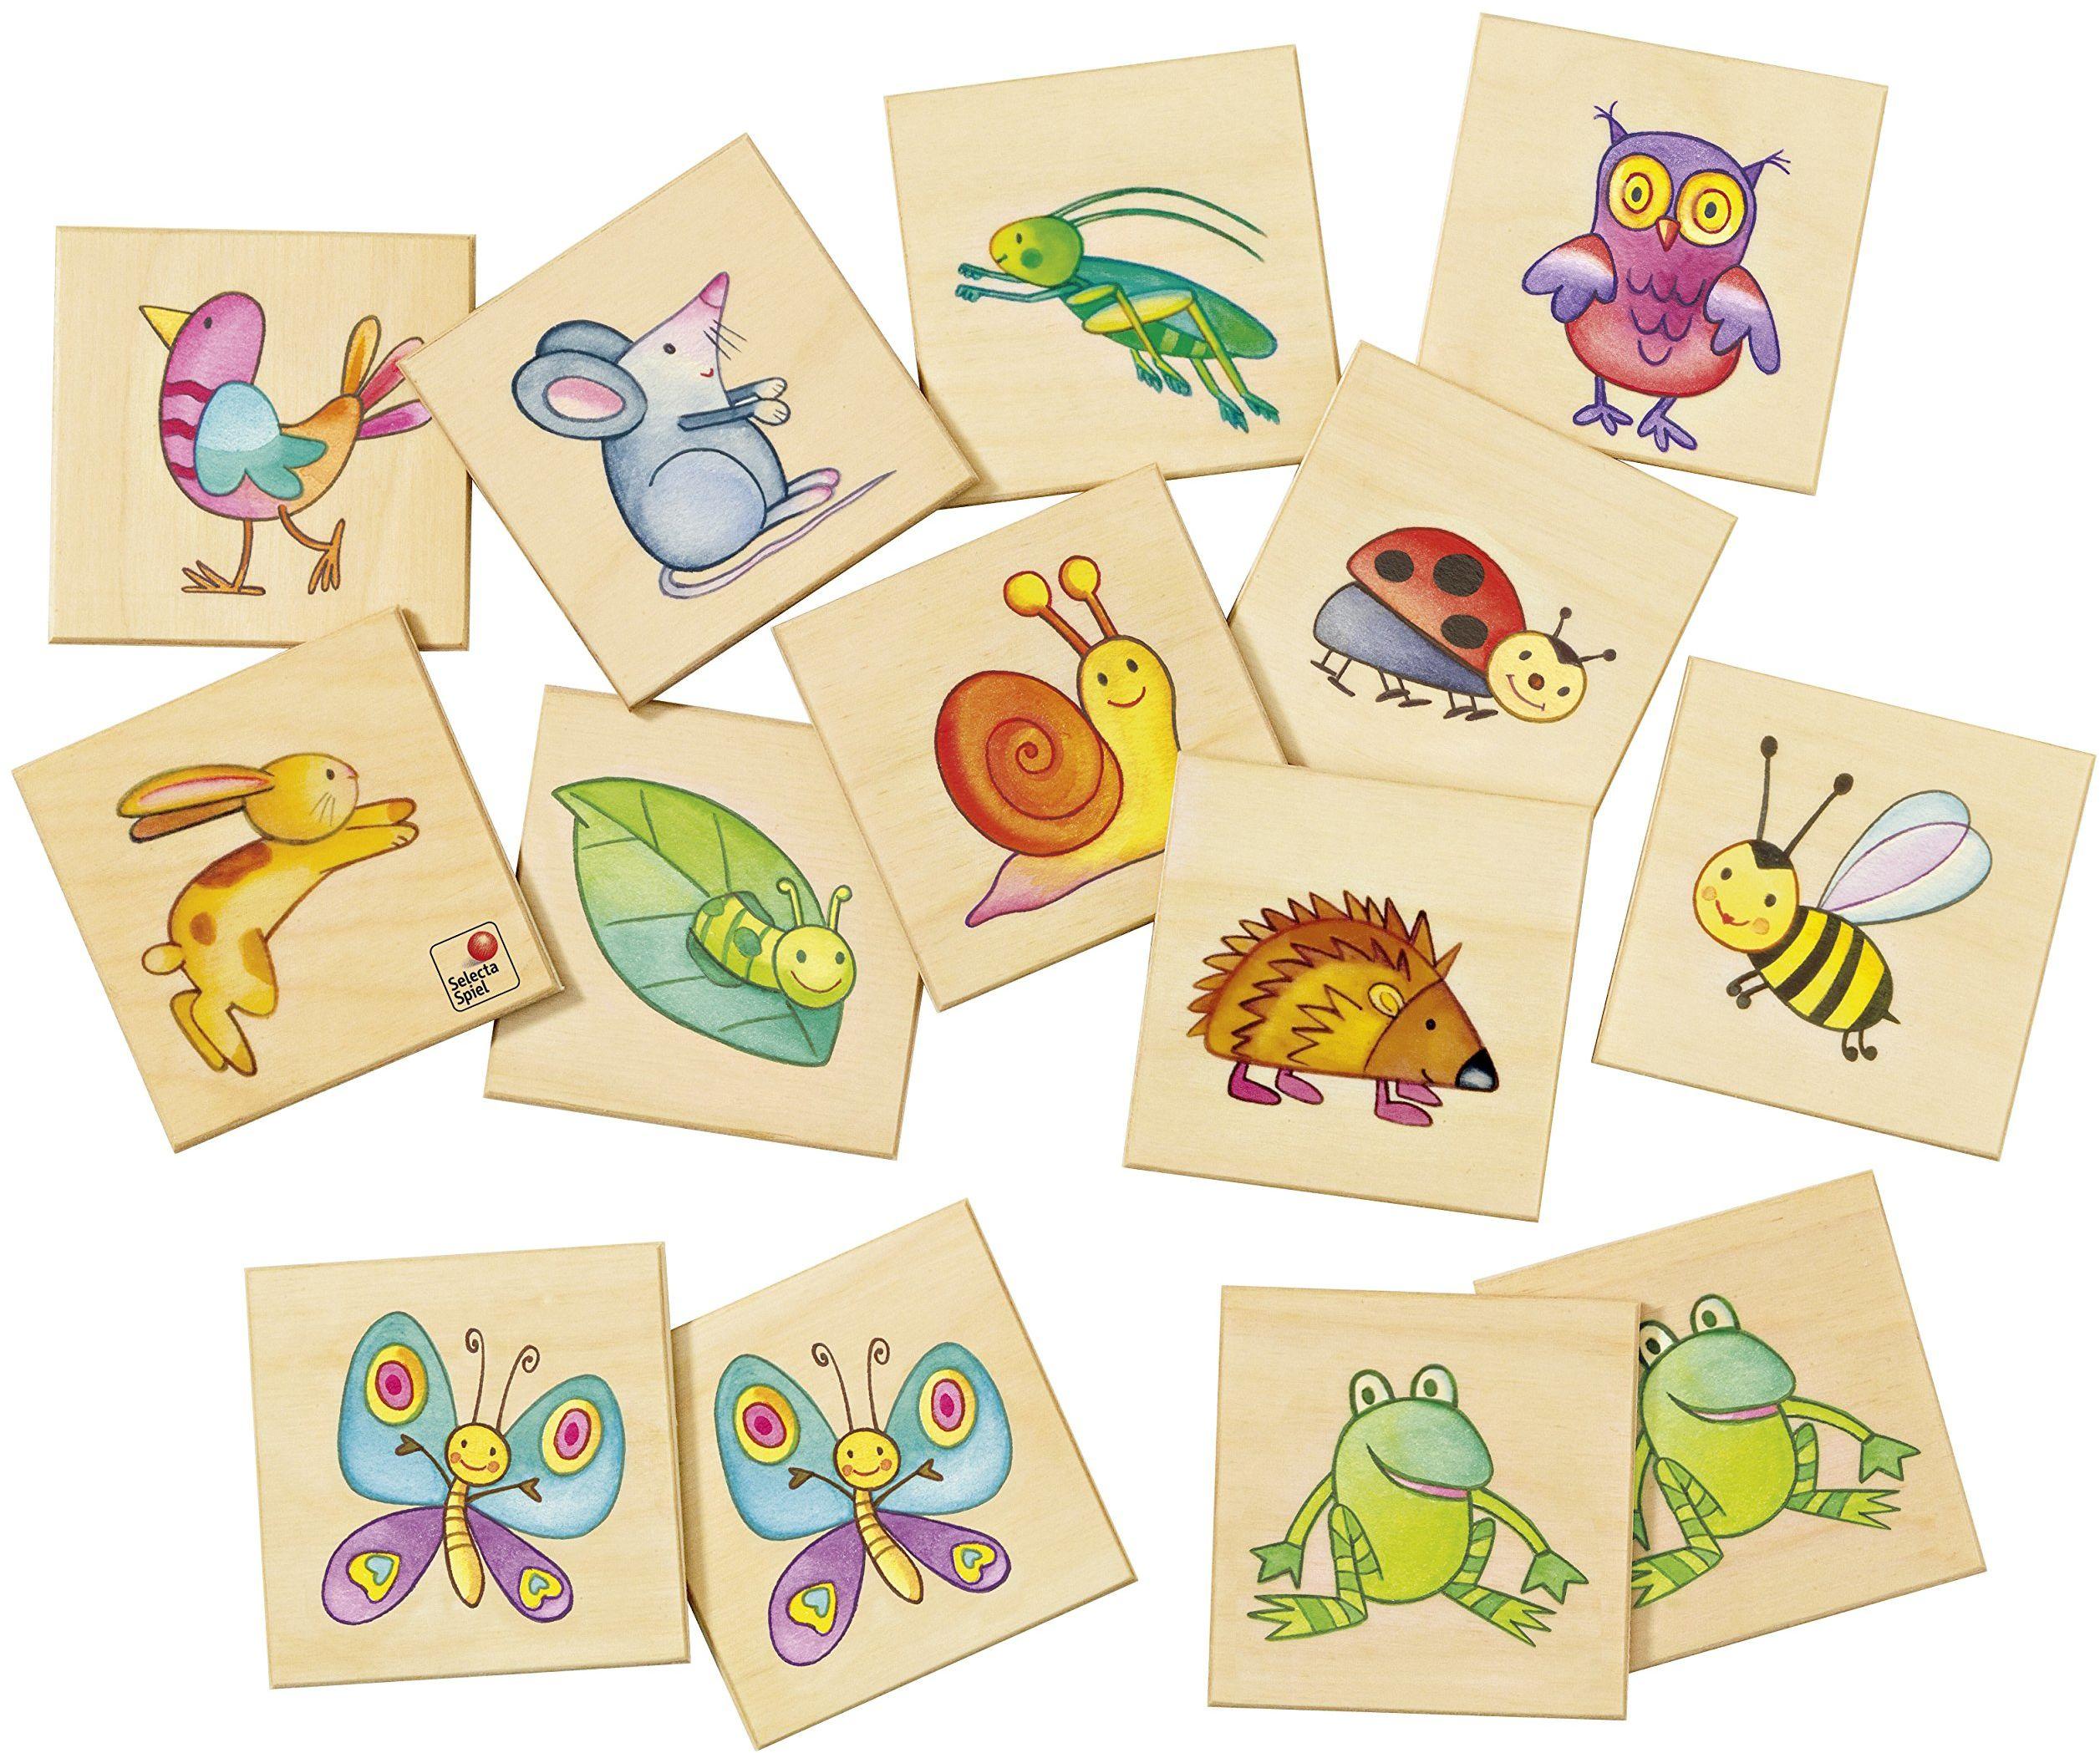 Selecta 63009 Memo Pepito i jego przyjaciele, lotto obrazkowe, 24 części